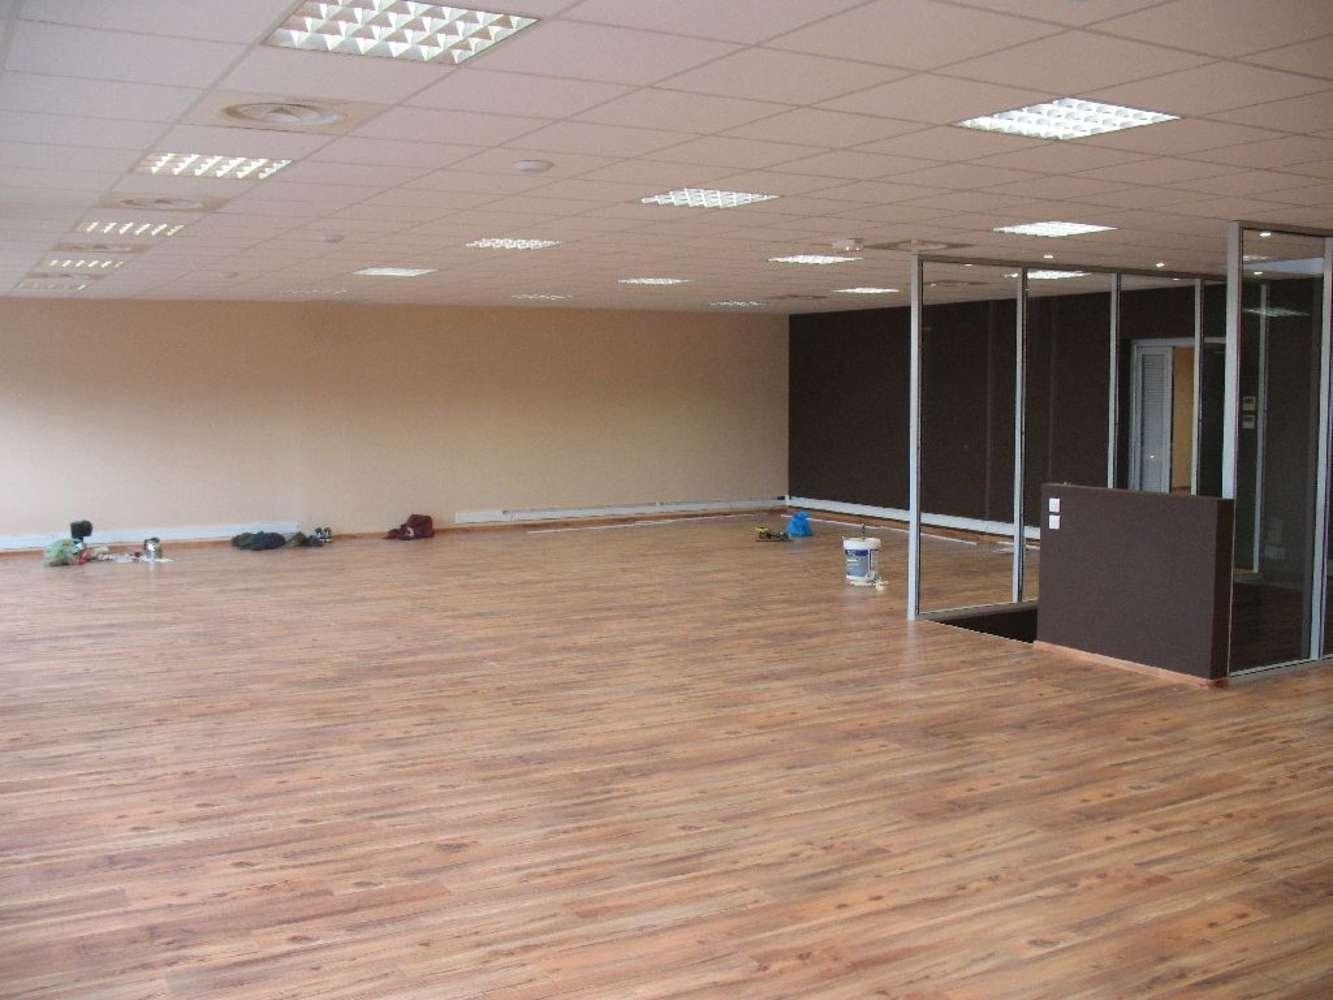 Activités/entrepôt Limonest, 69760 - Location bâtiment mixte TECHLID (Lyon) - 9837401